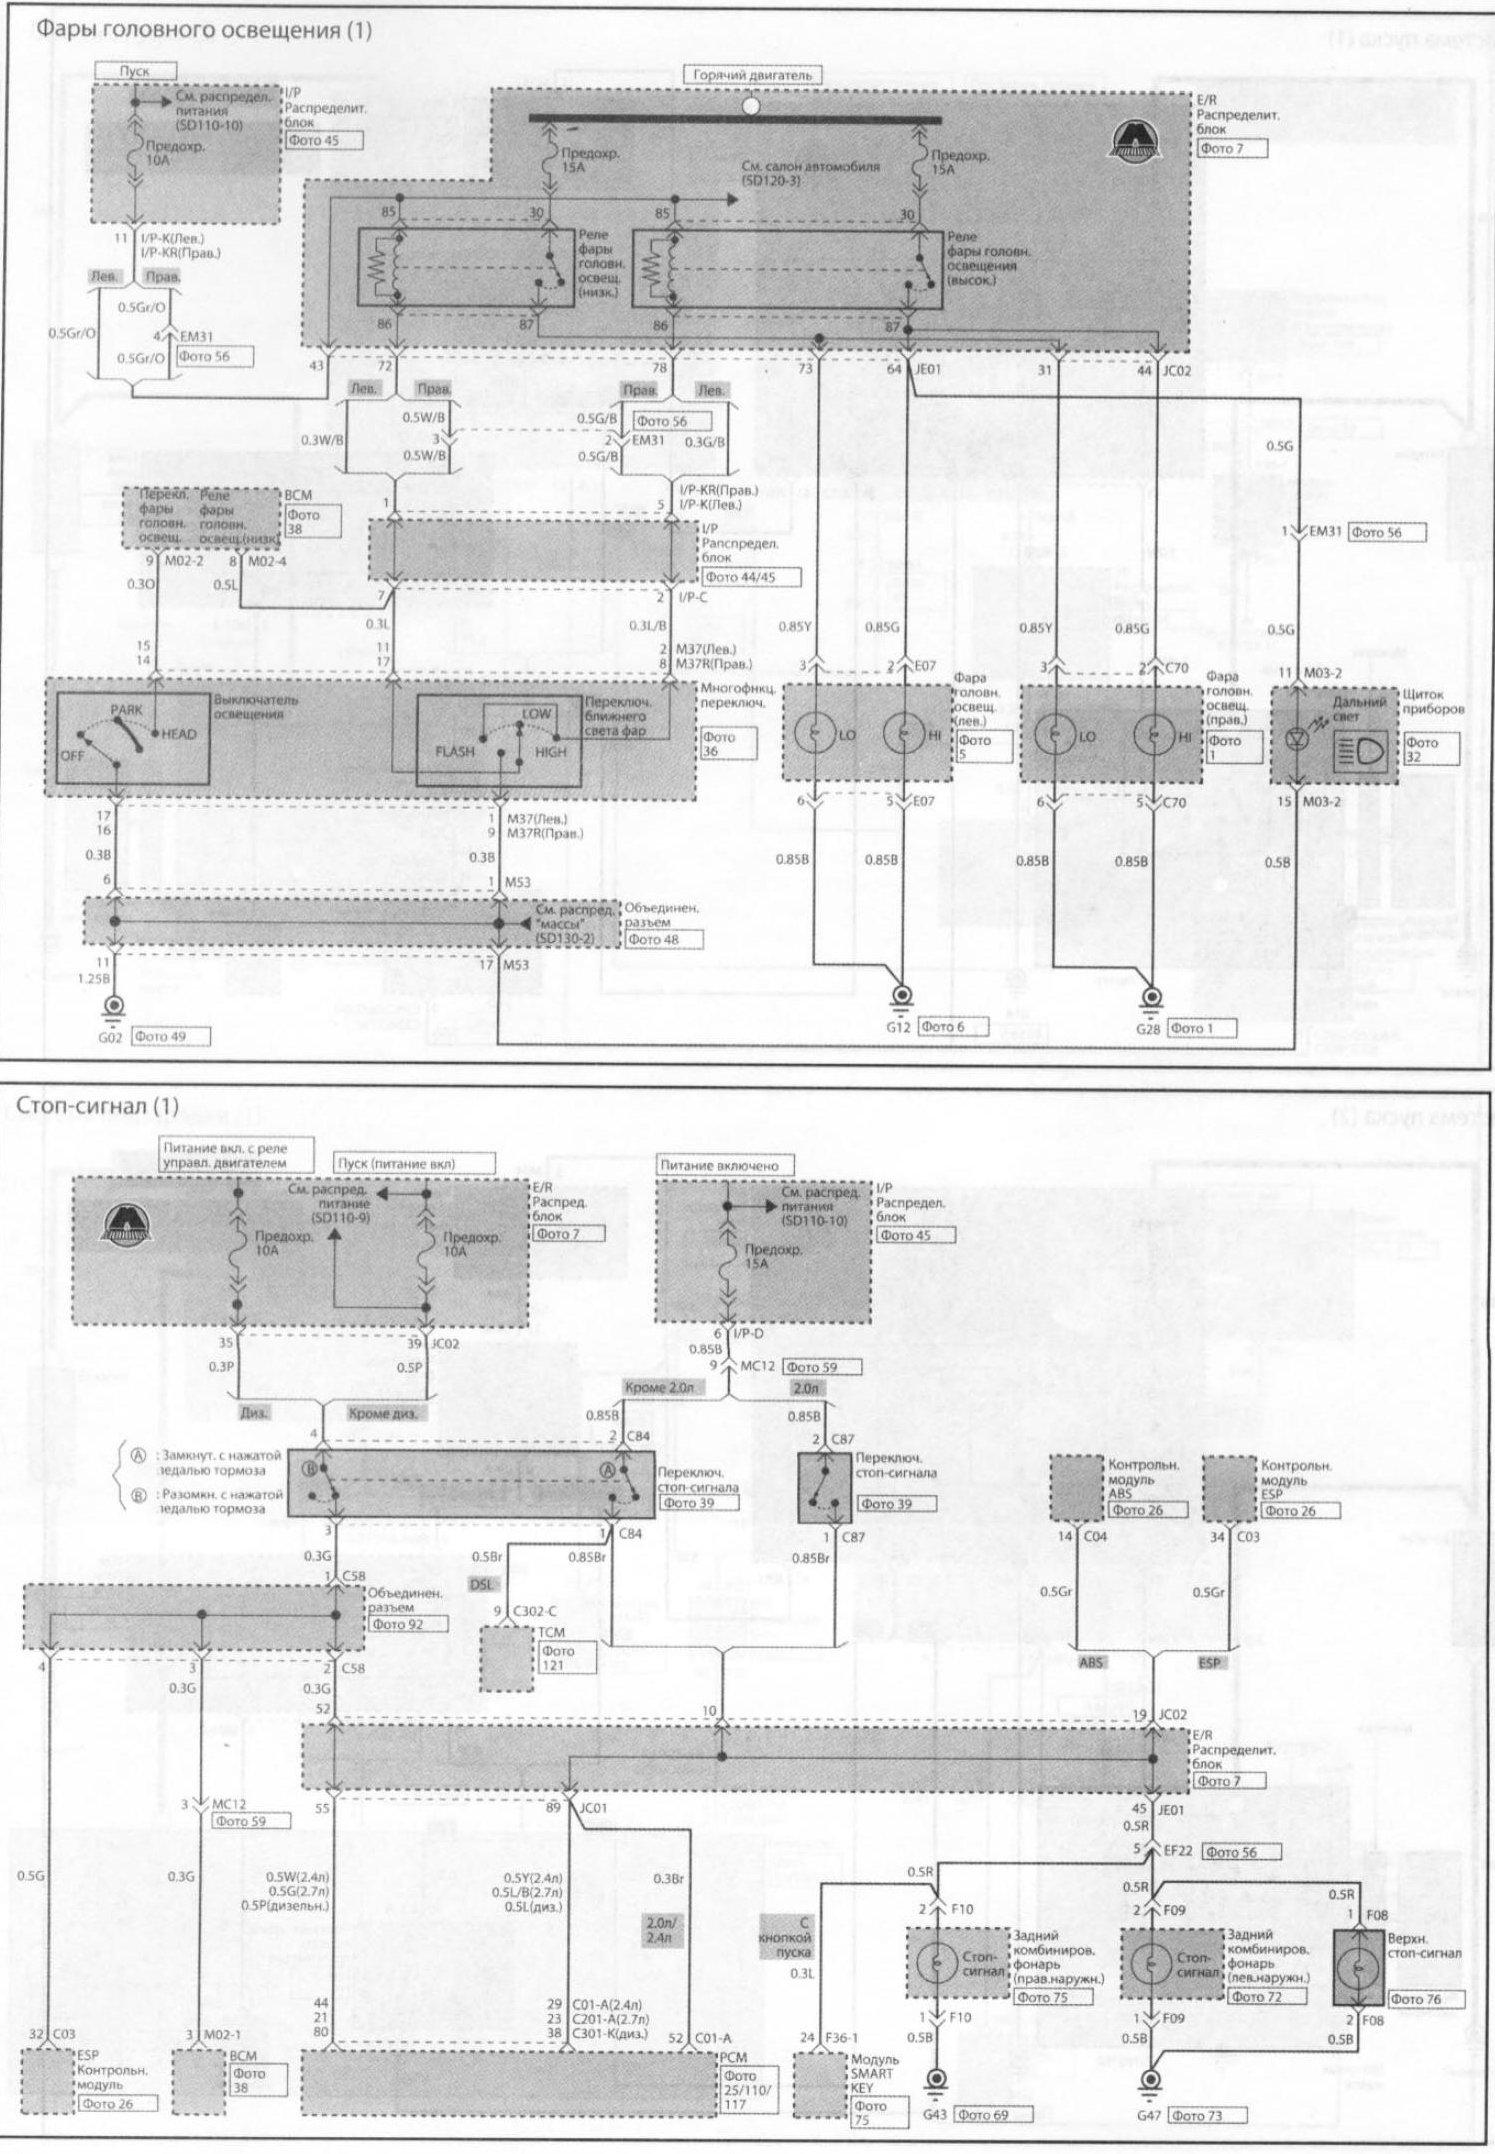 hight resolution of kia wiring diagrams 11 11 nuerasolar co u2022kia car manuals wiring diagrams pdf fault codes